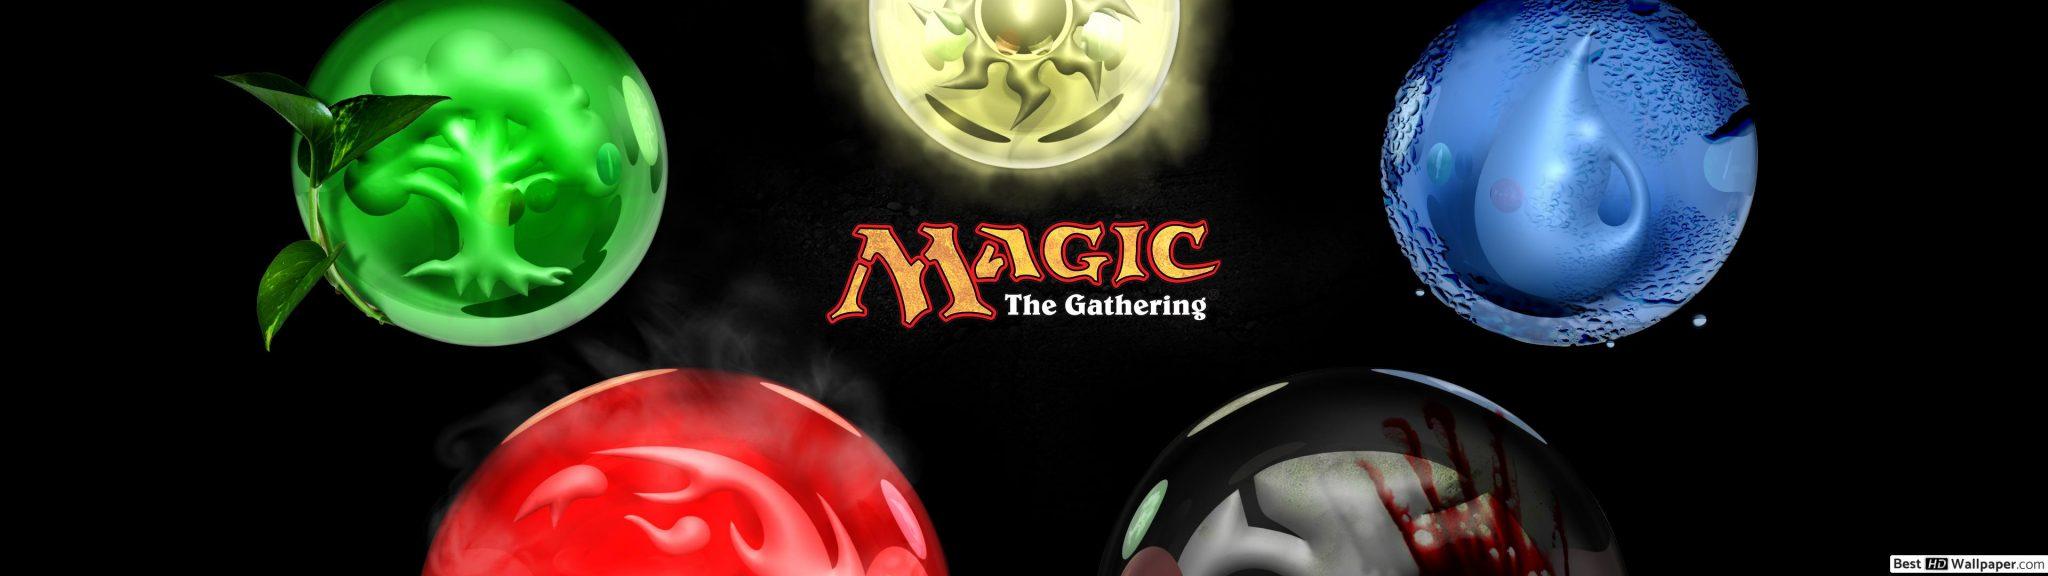 Magic: the Gathering, in arrivo il documentario ufficiale thumbnail